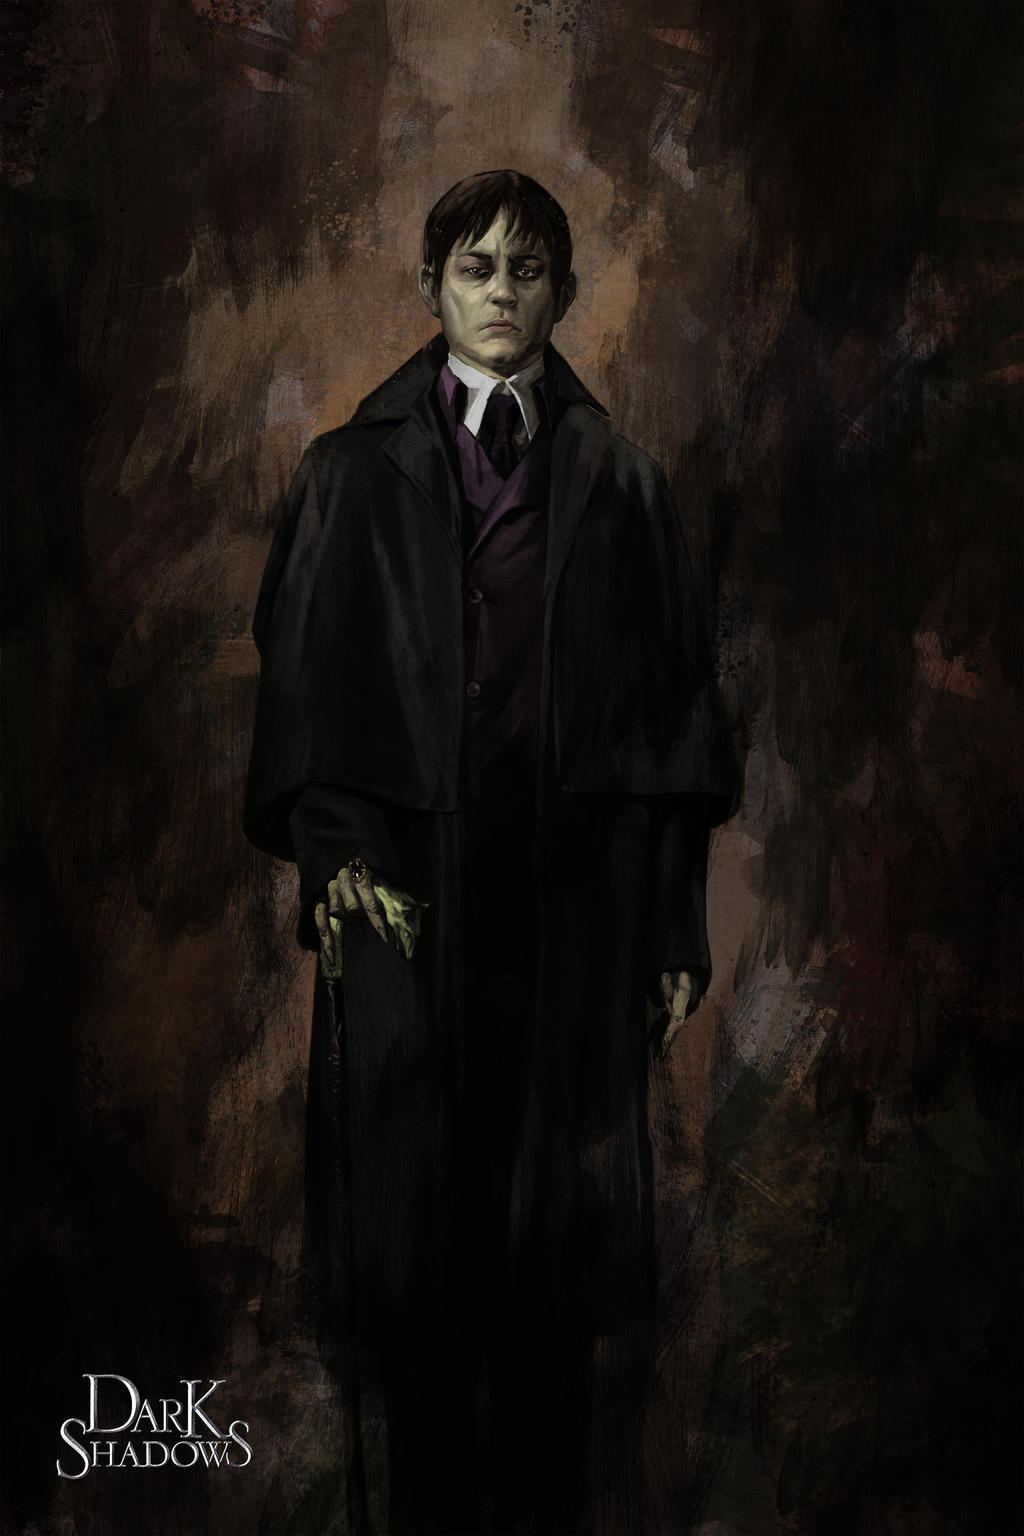 Dark Shadows: Barnabas Portrait by poojipoo